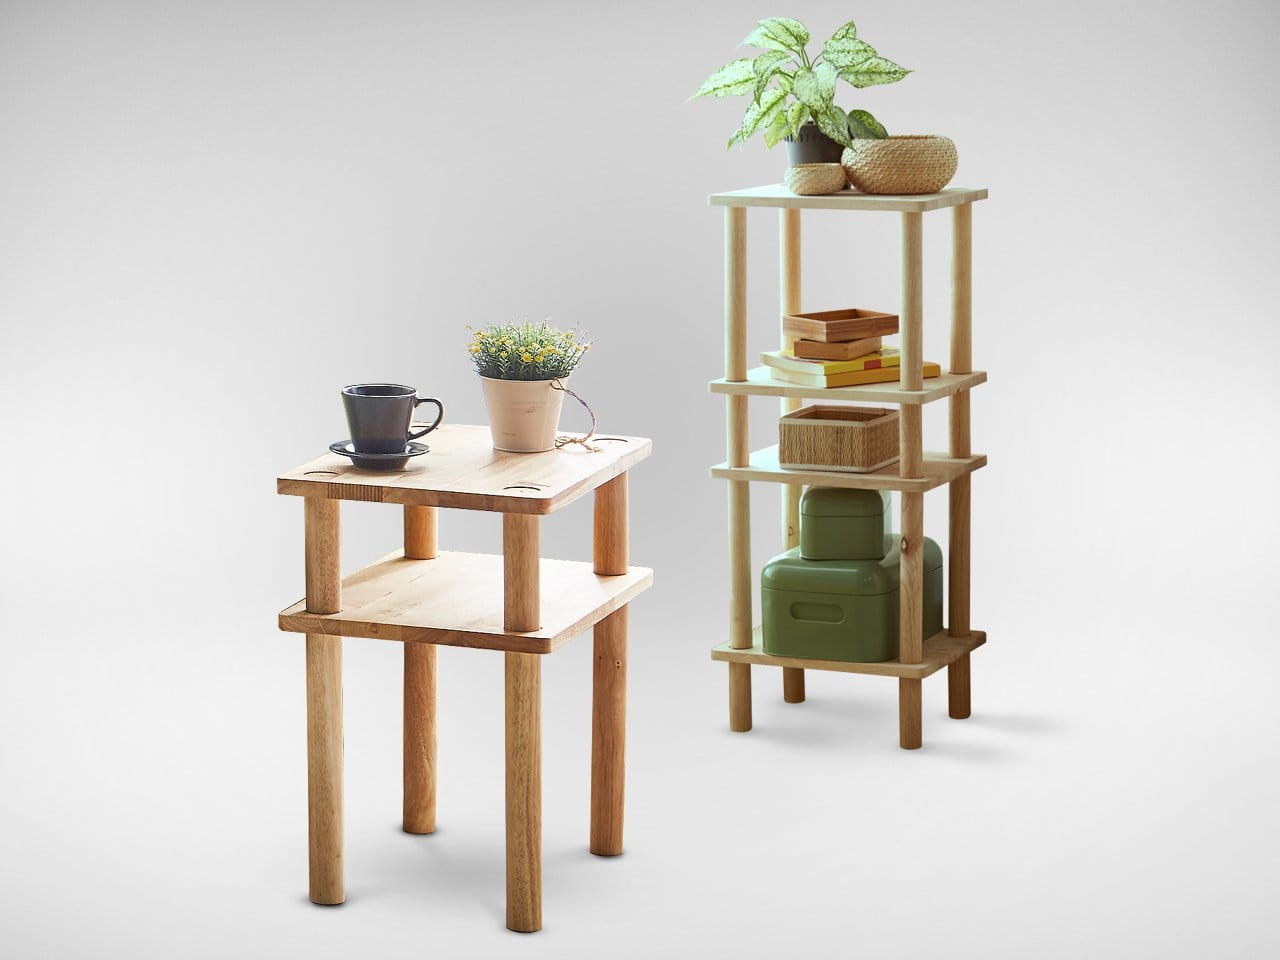 Hakone Small Coffee Table Shelf Comfort Design The Chair Table People